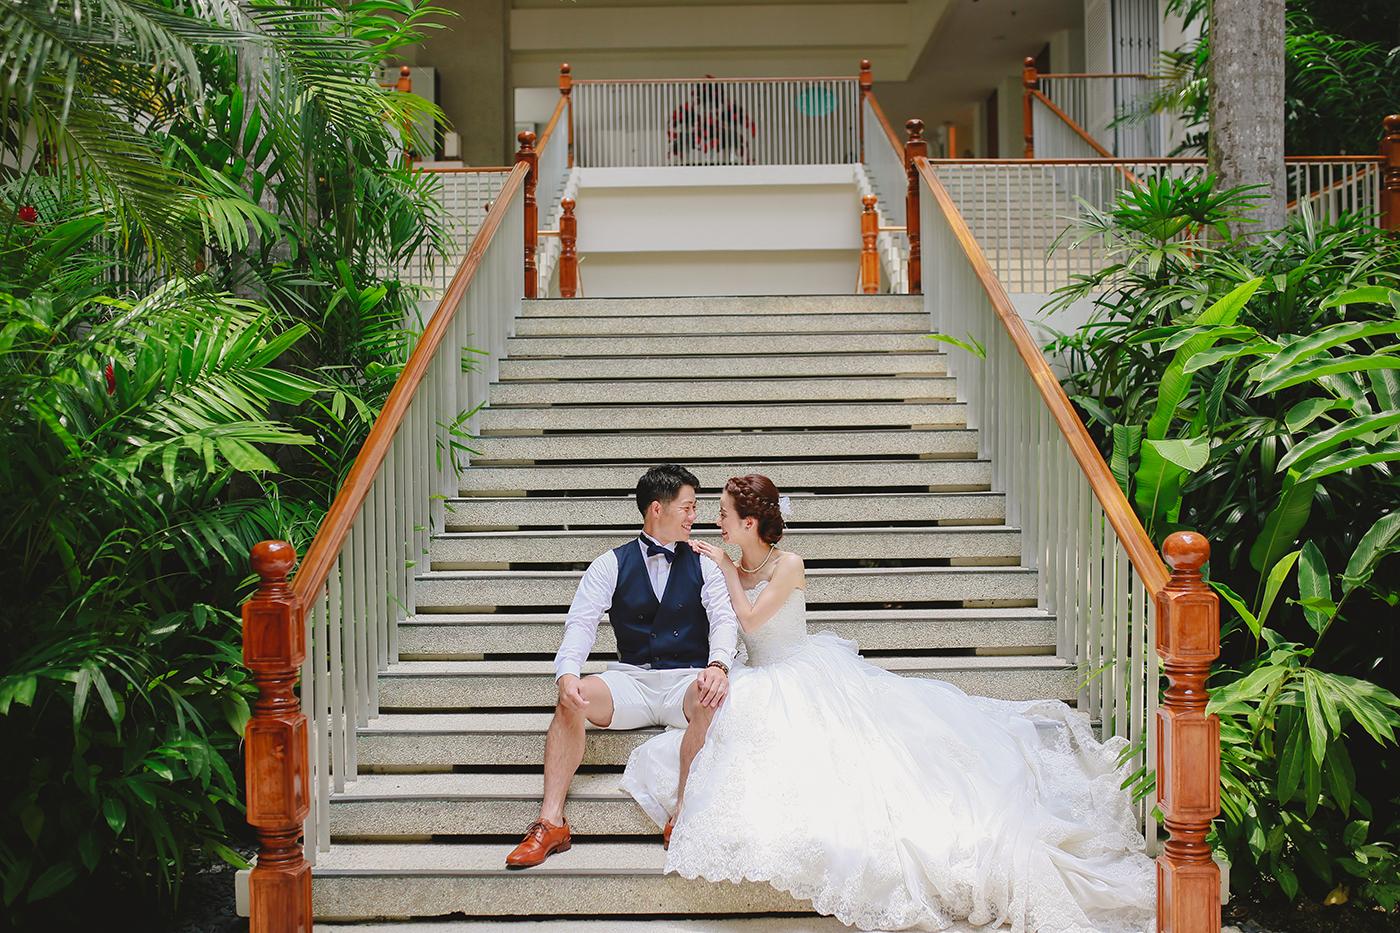 Shangri-la Mactan Post Wedding - Yudai & Kana